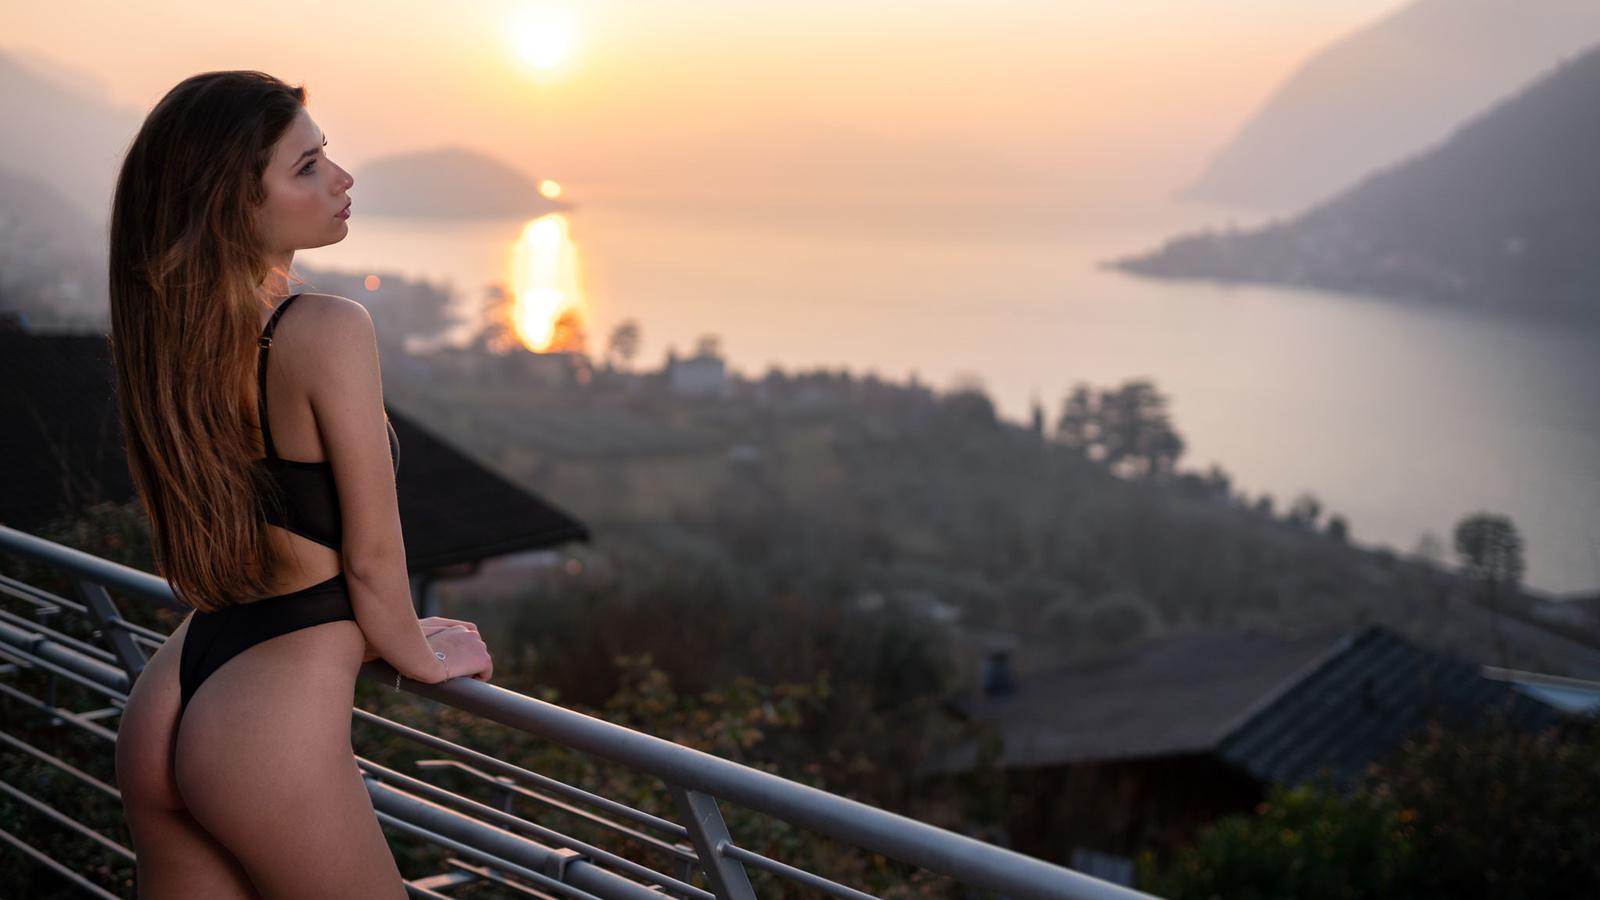 women, marco squassina, sunset, sea, body lingerie, brunette, women outdoors, looking away, ass, long hair, black lingerie, balcony